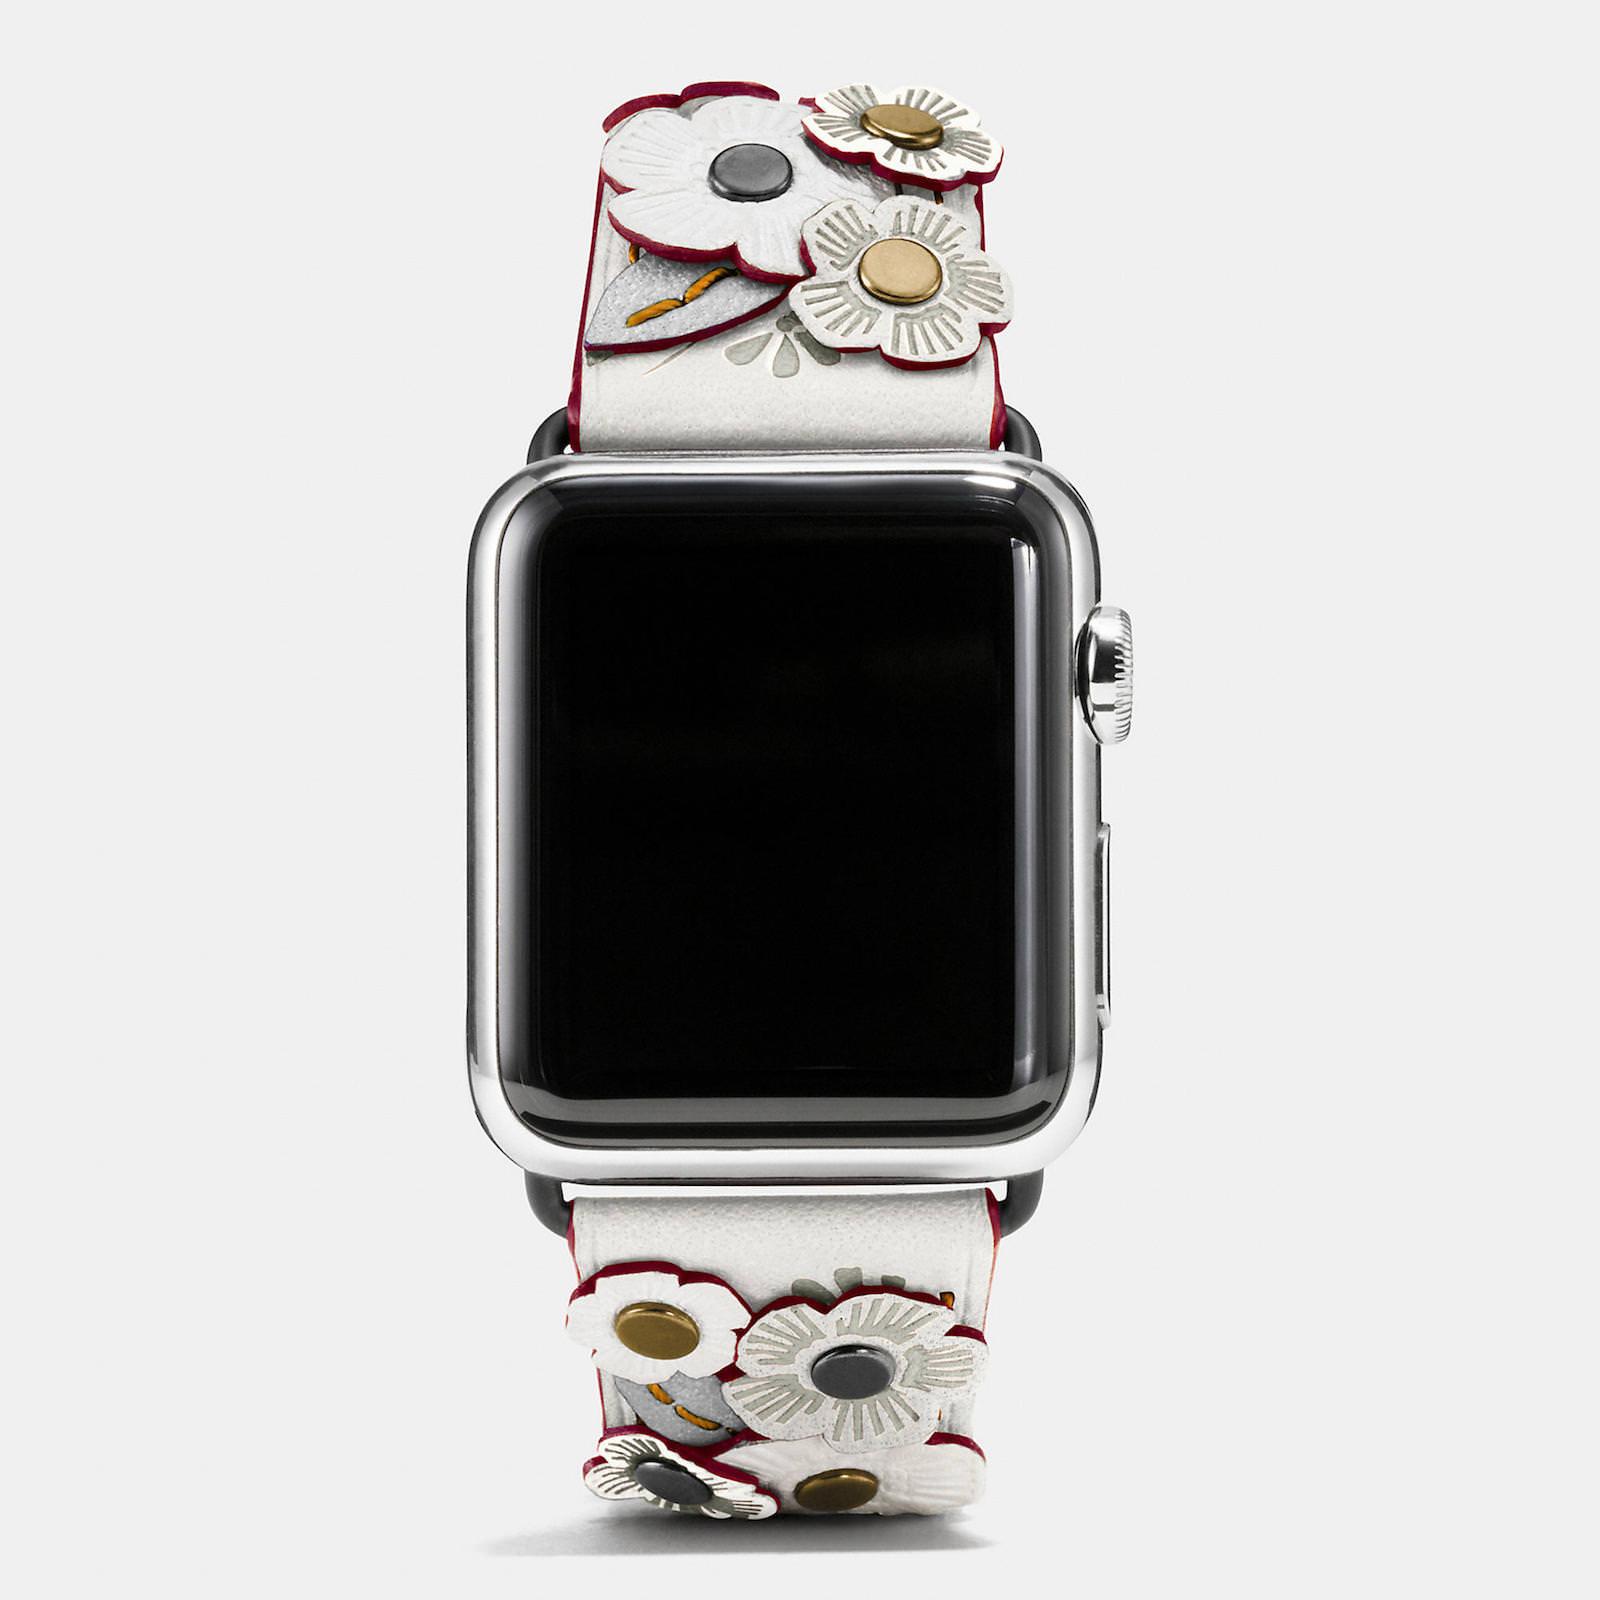 Apple-Watch-Coach-Band-Autumn-Season-11.jpeg